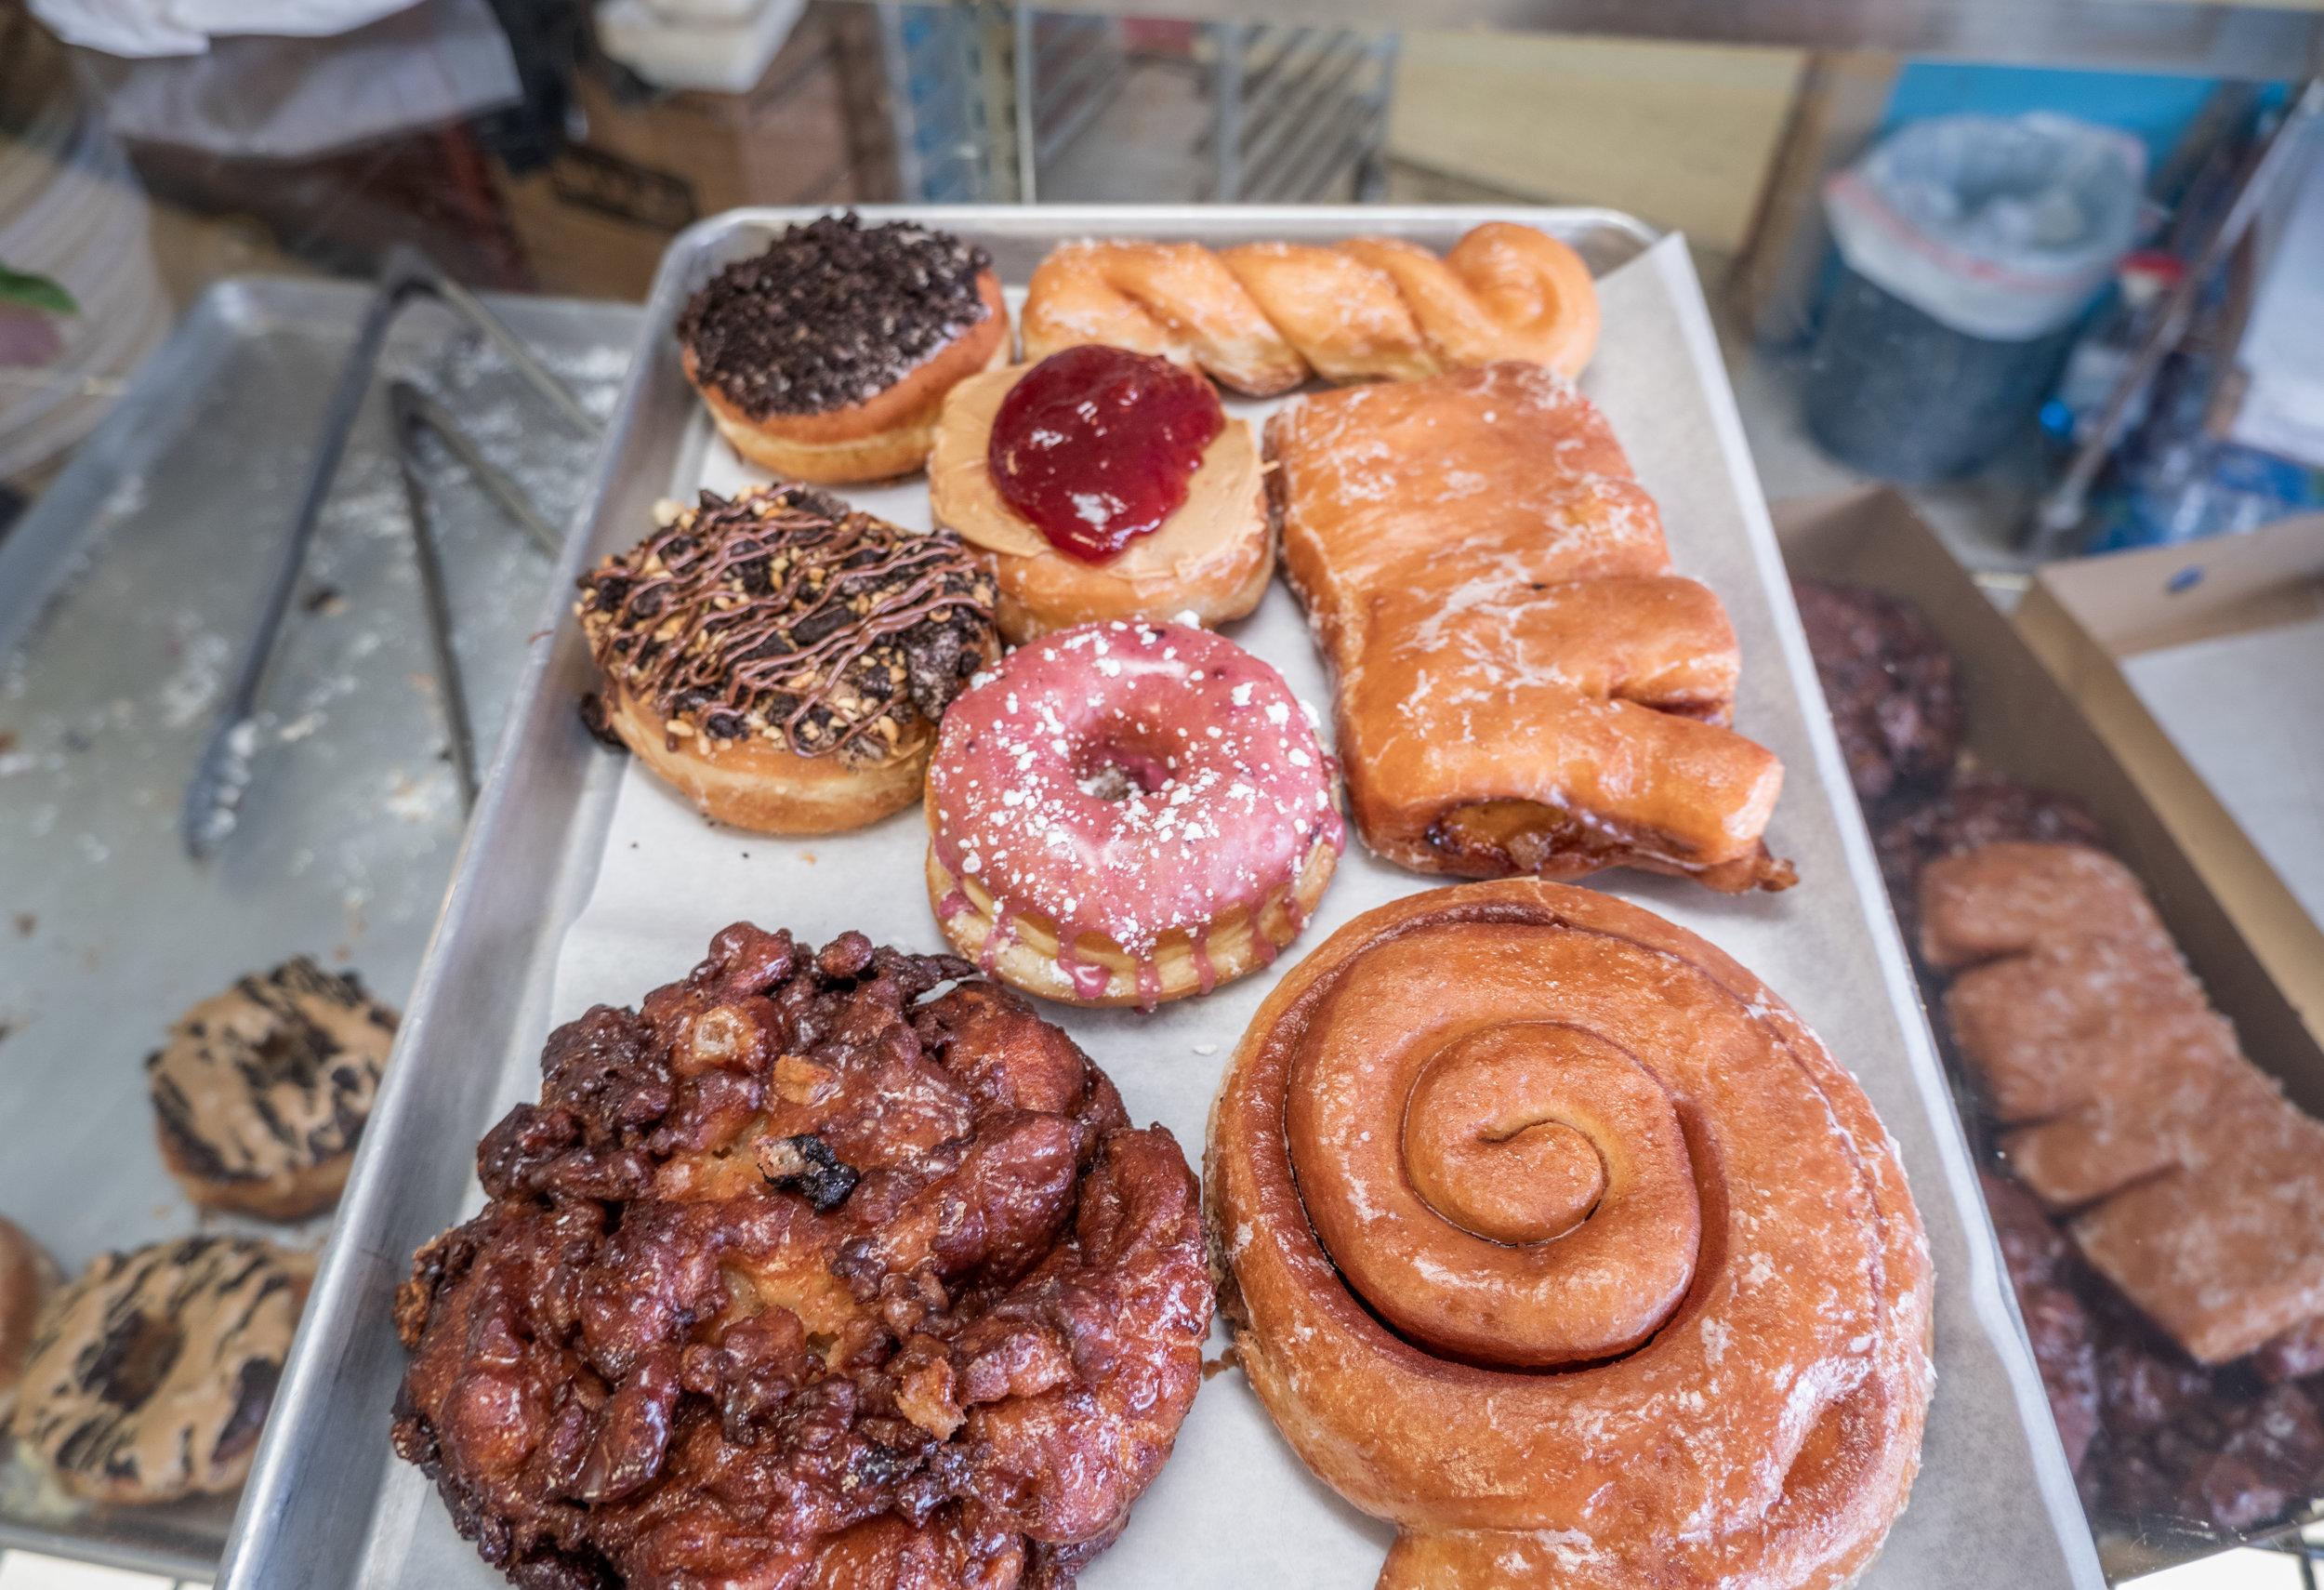 Delicious Donuts - Portland Oregon - Nathaniel Barber Blog